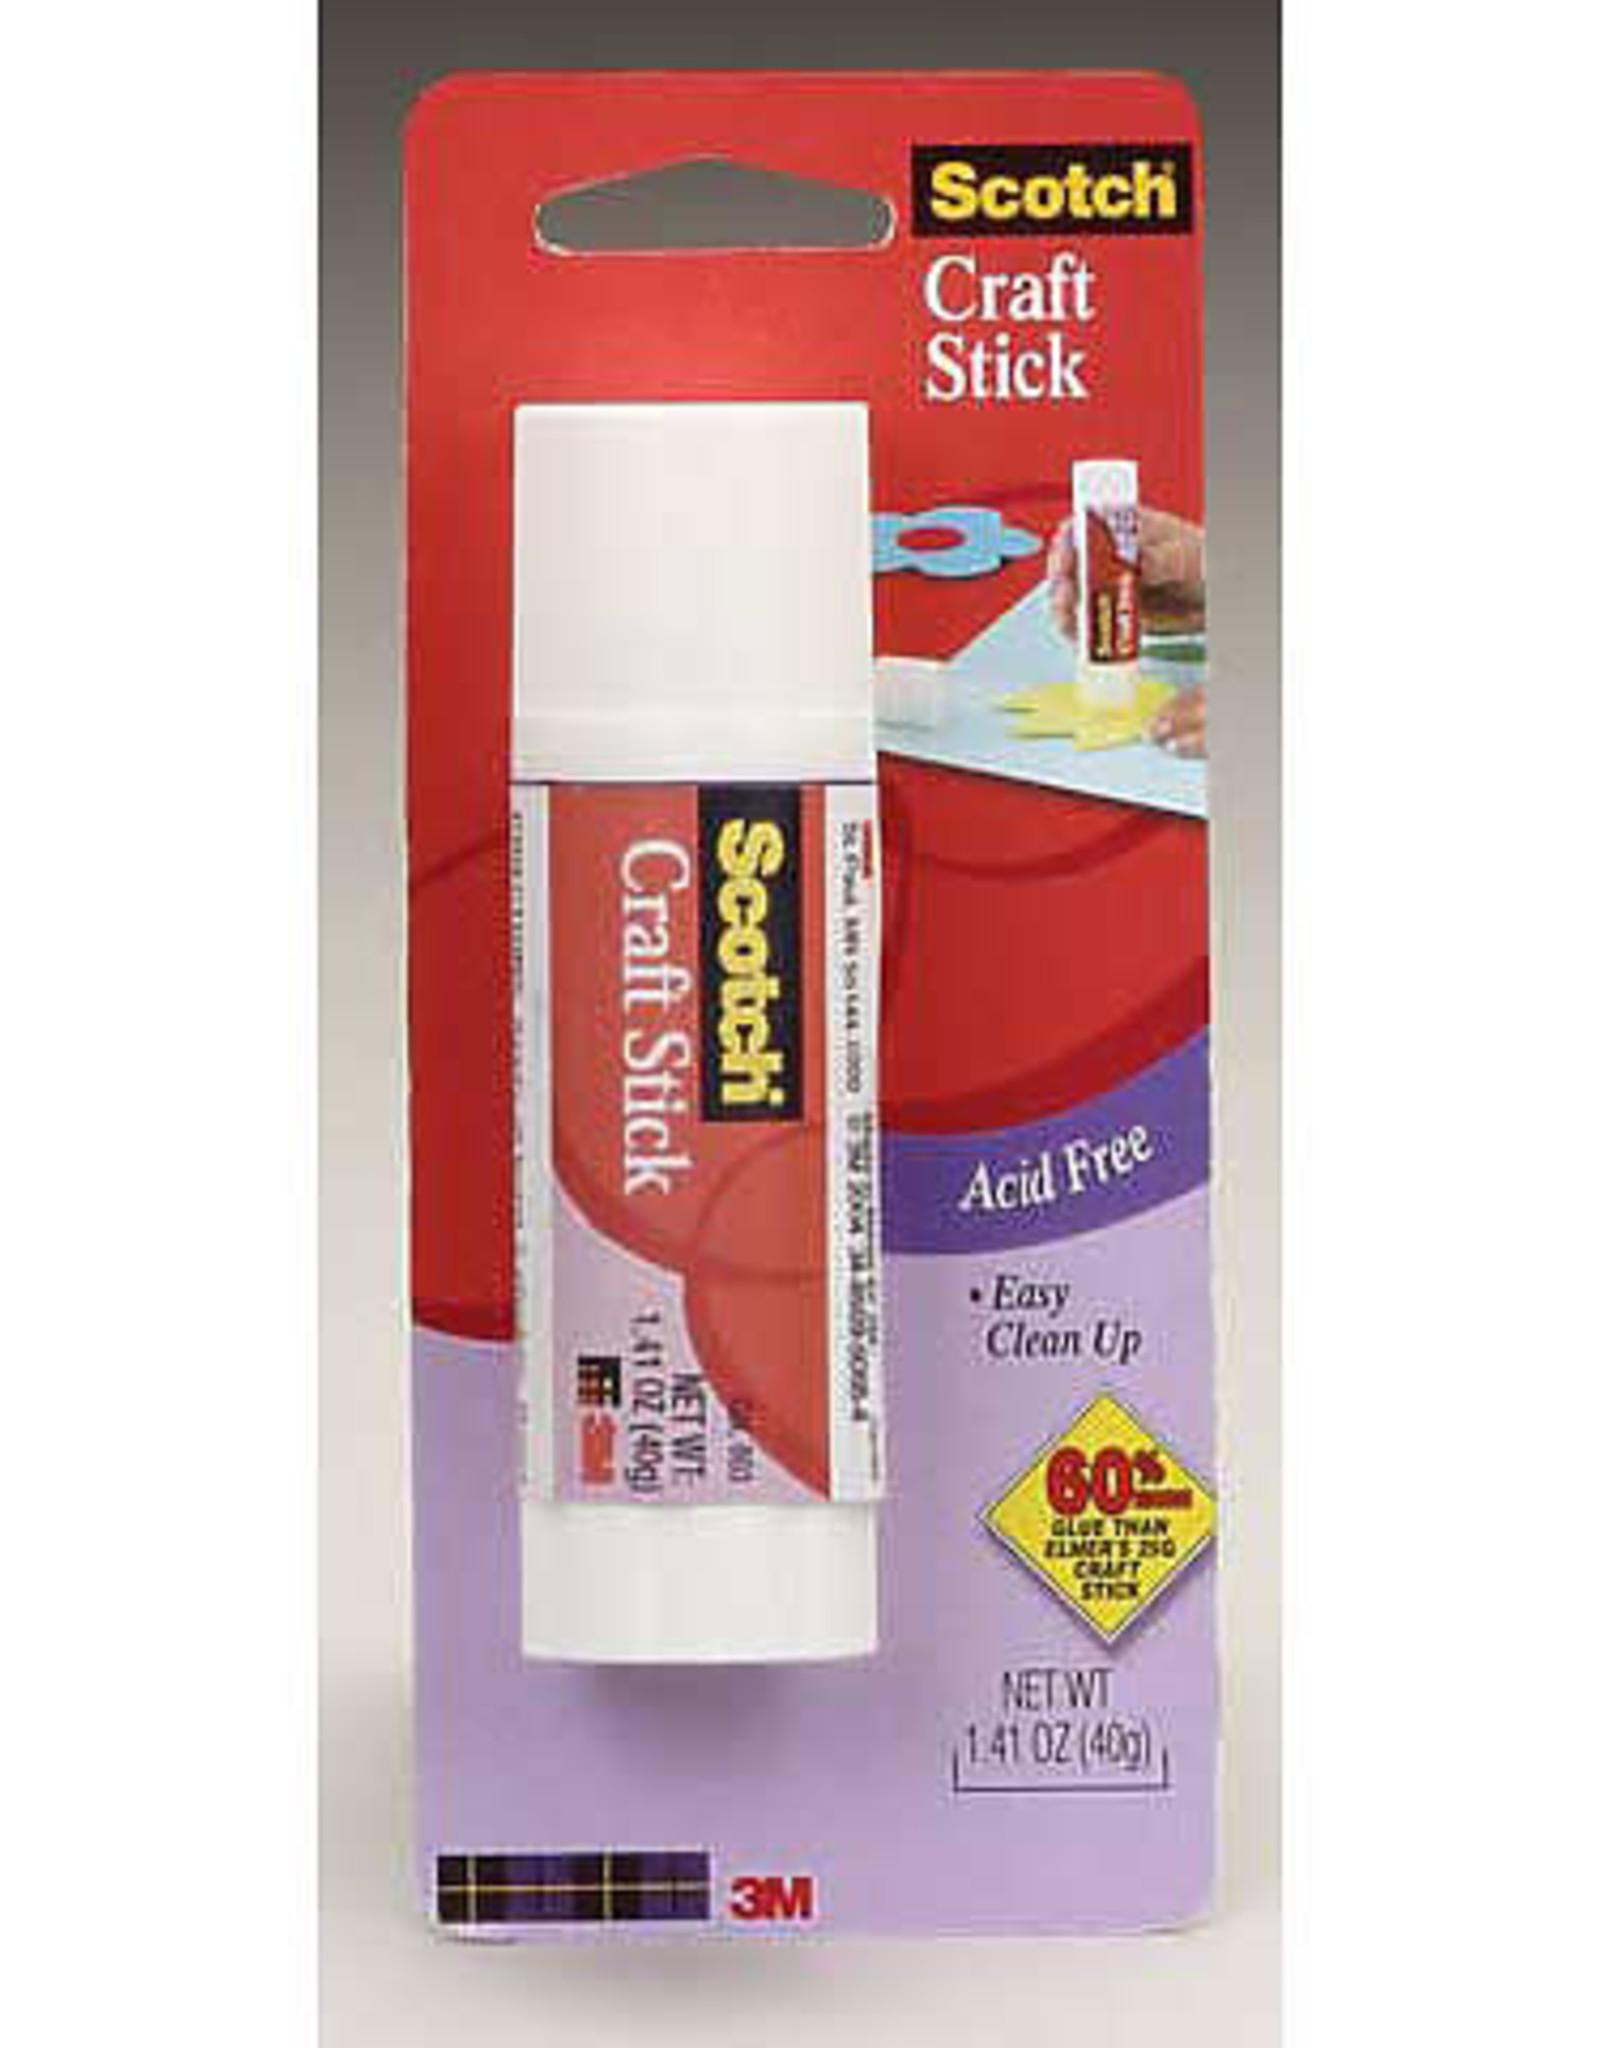 Scotch Acid-Free Glue Stick, 1.41 oz.